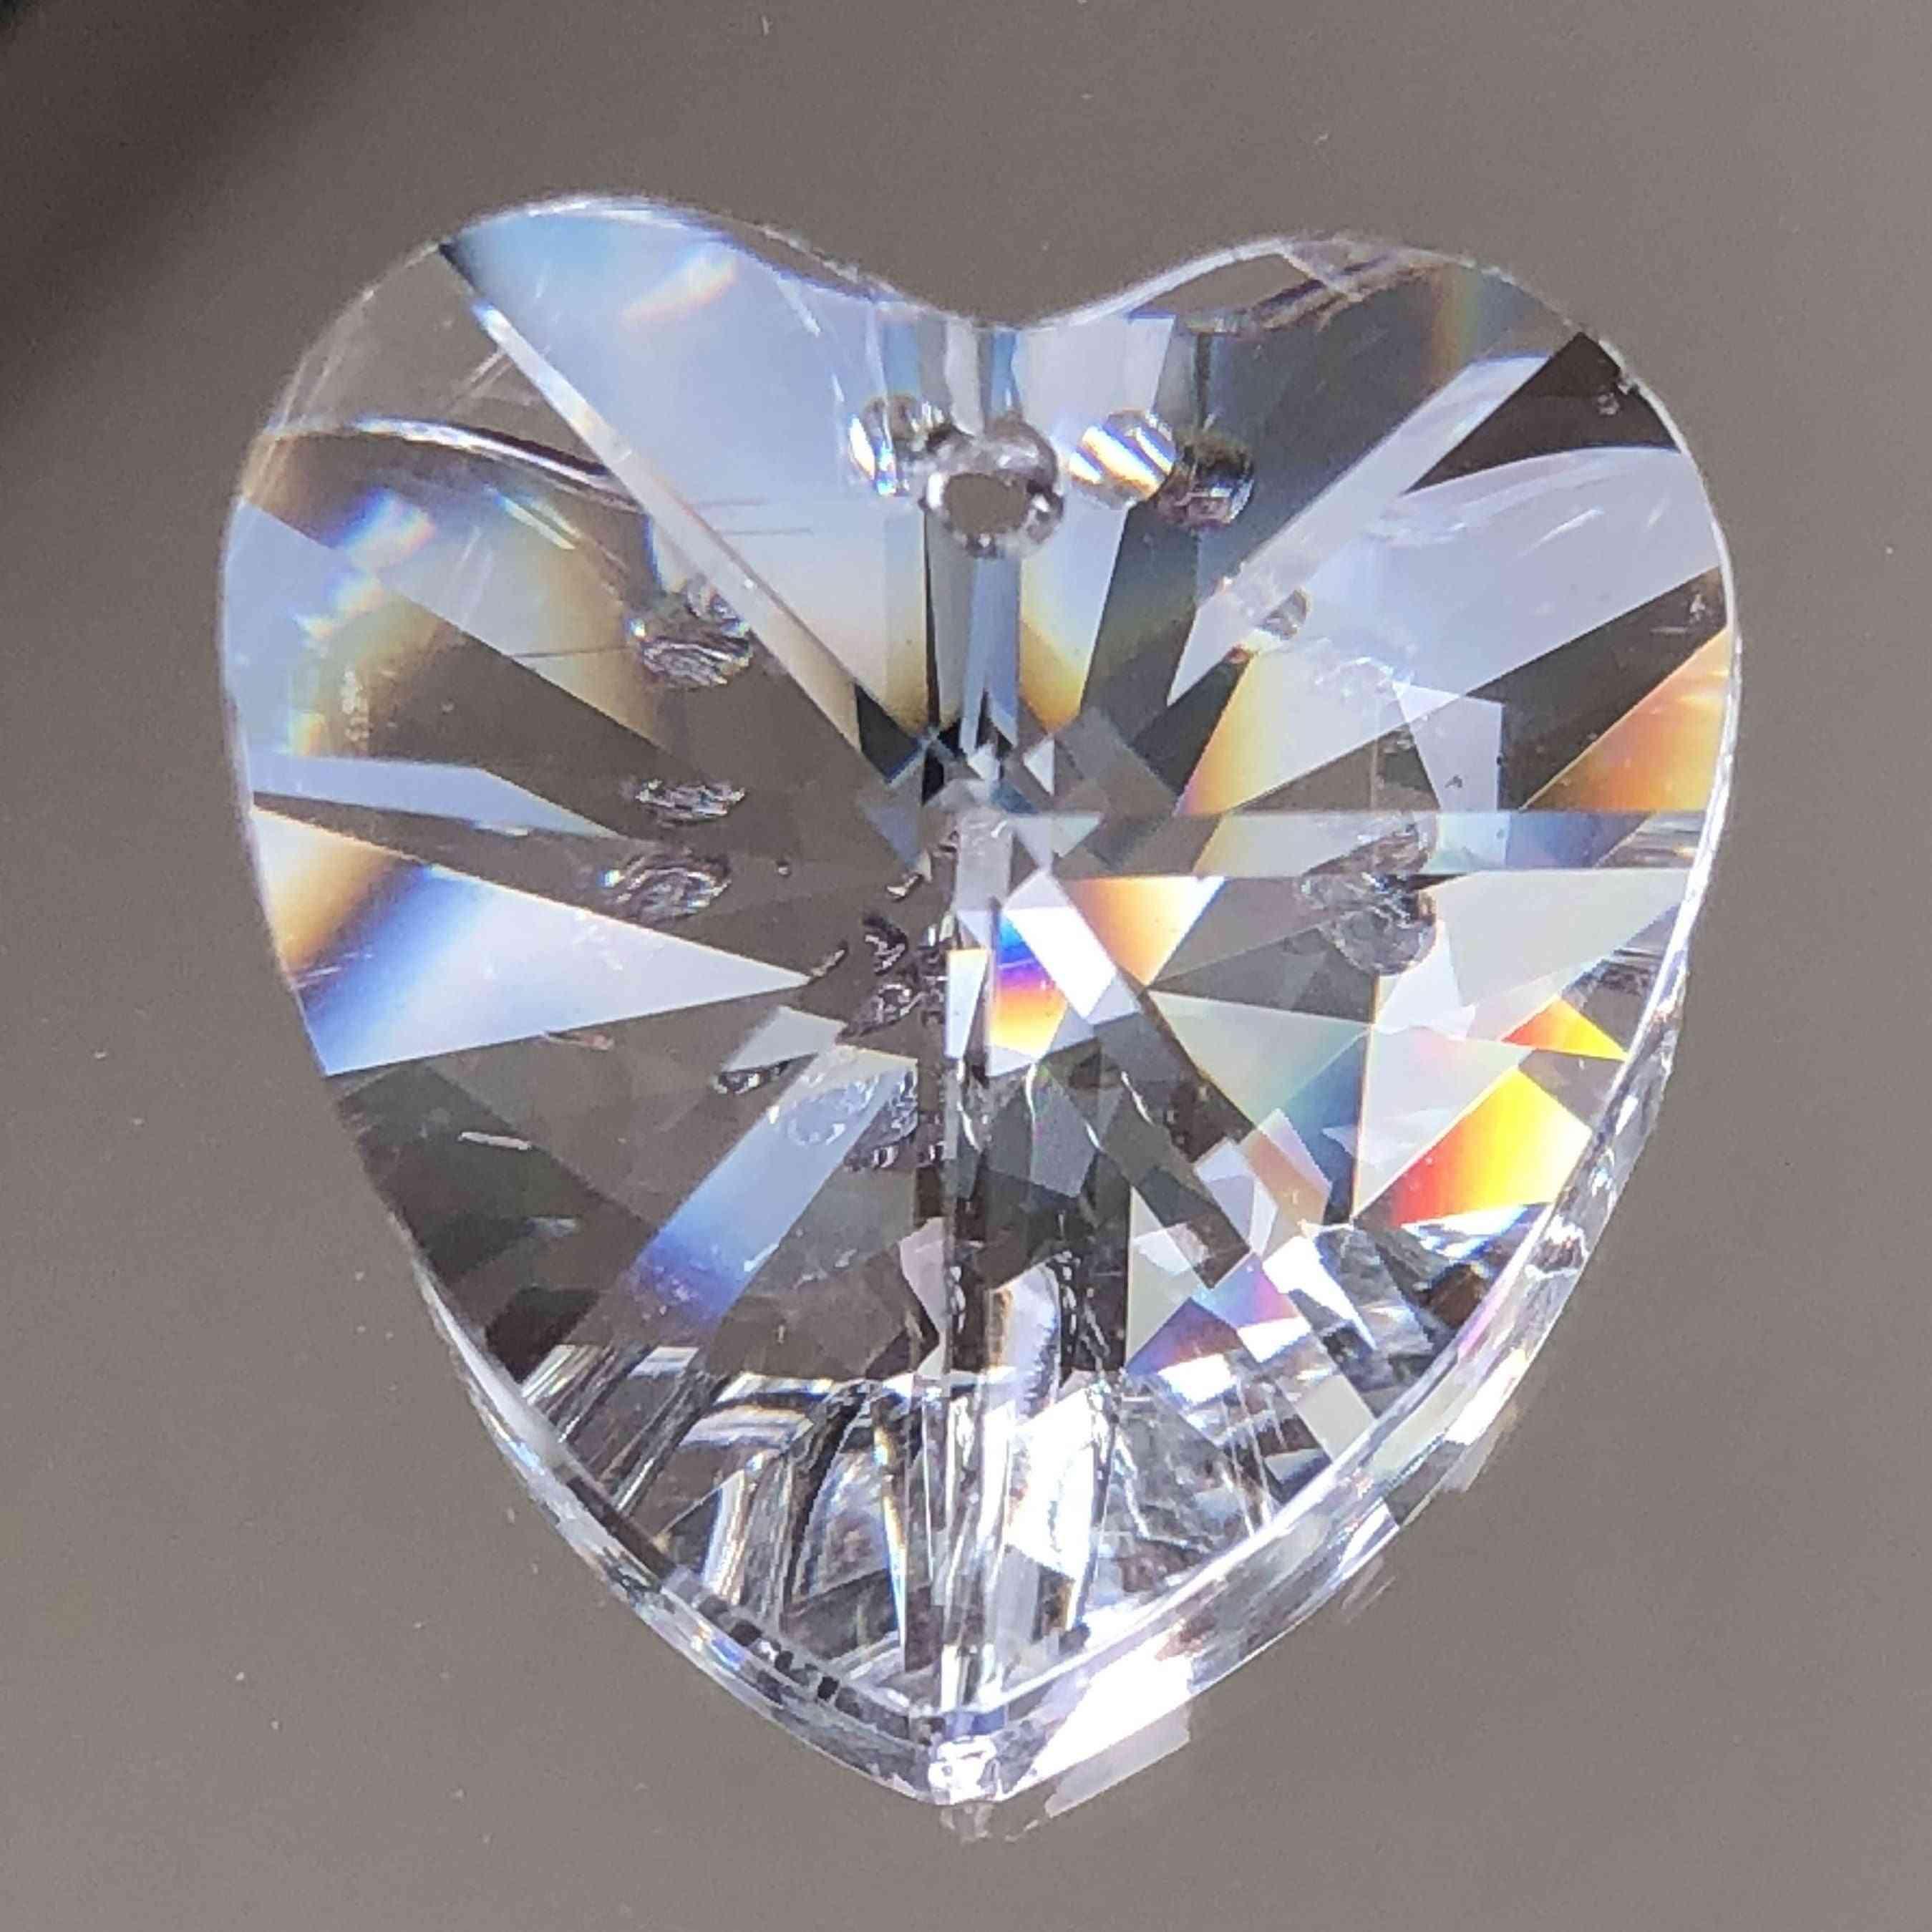 45mm Heart Shape Crystal Prisms For Diy Chandelier Hanging, Pendant, Suncatcher, Glass Art, Home Decor